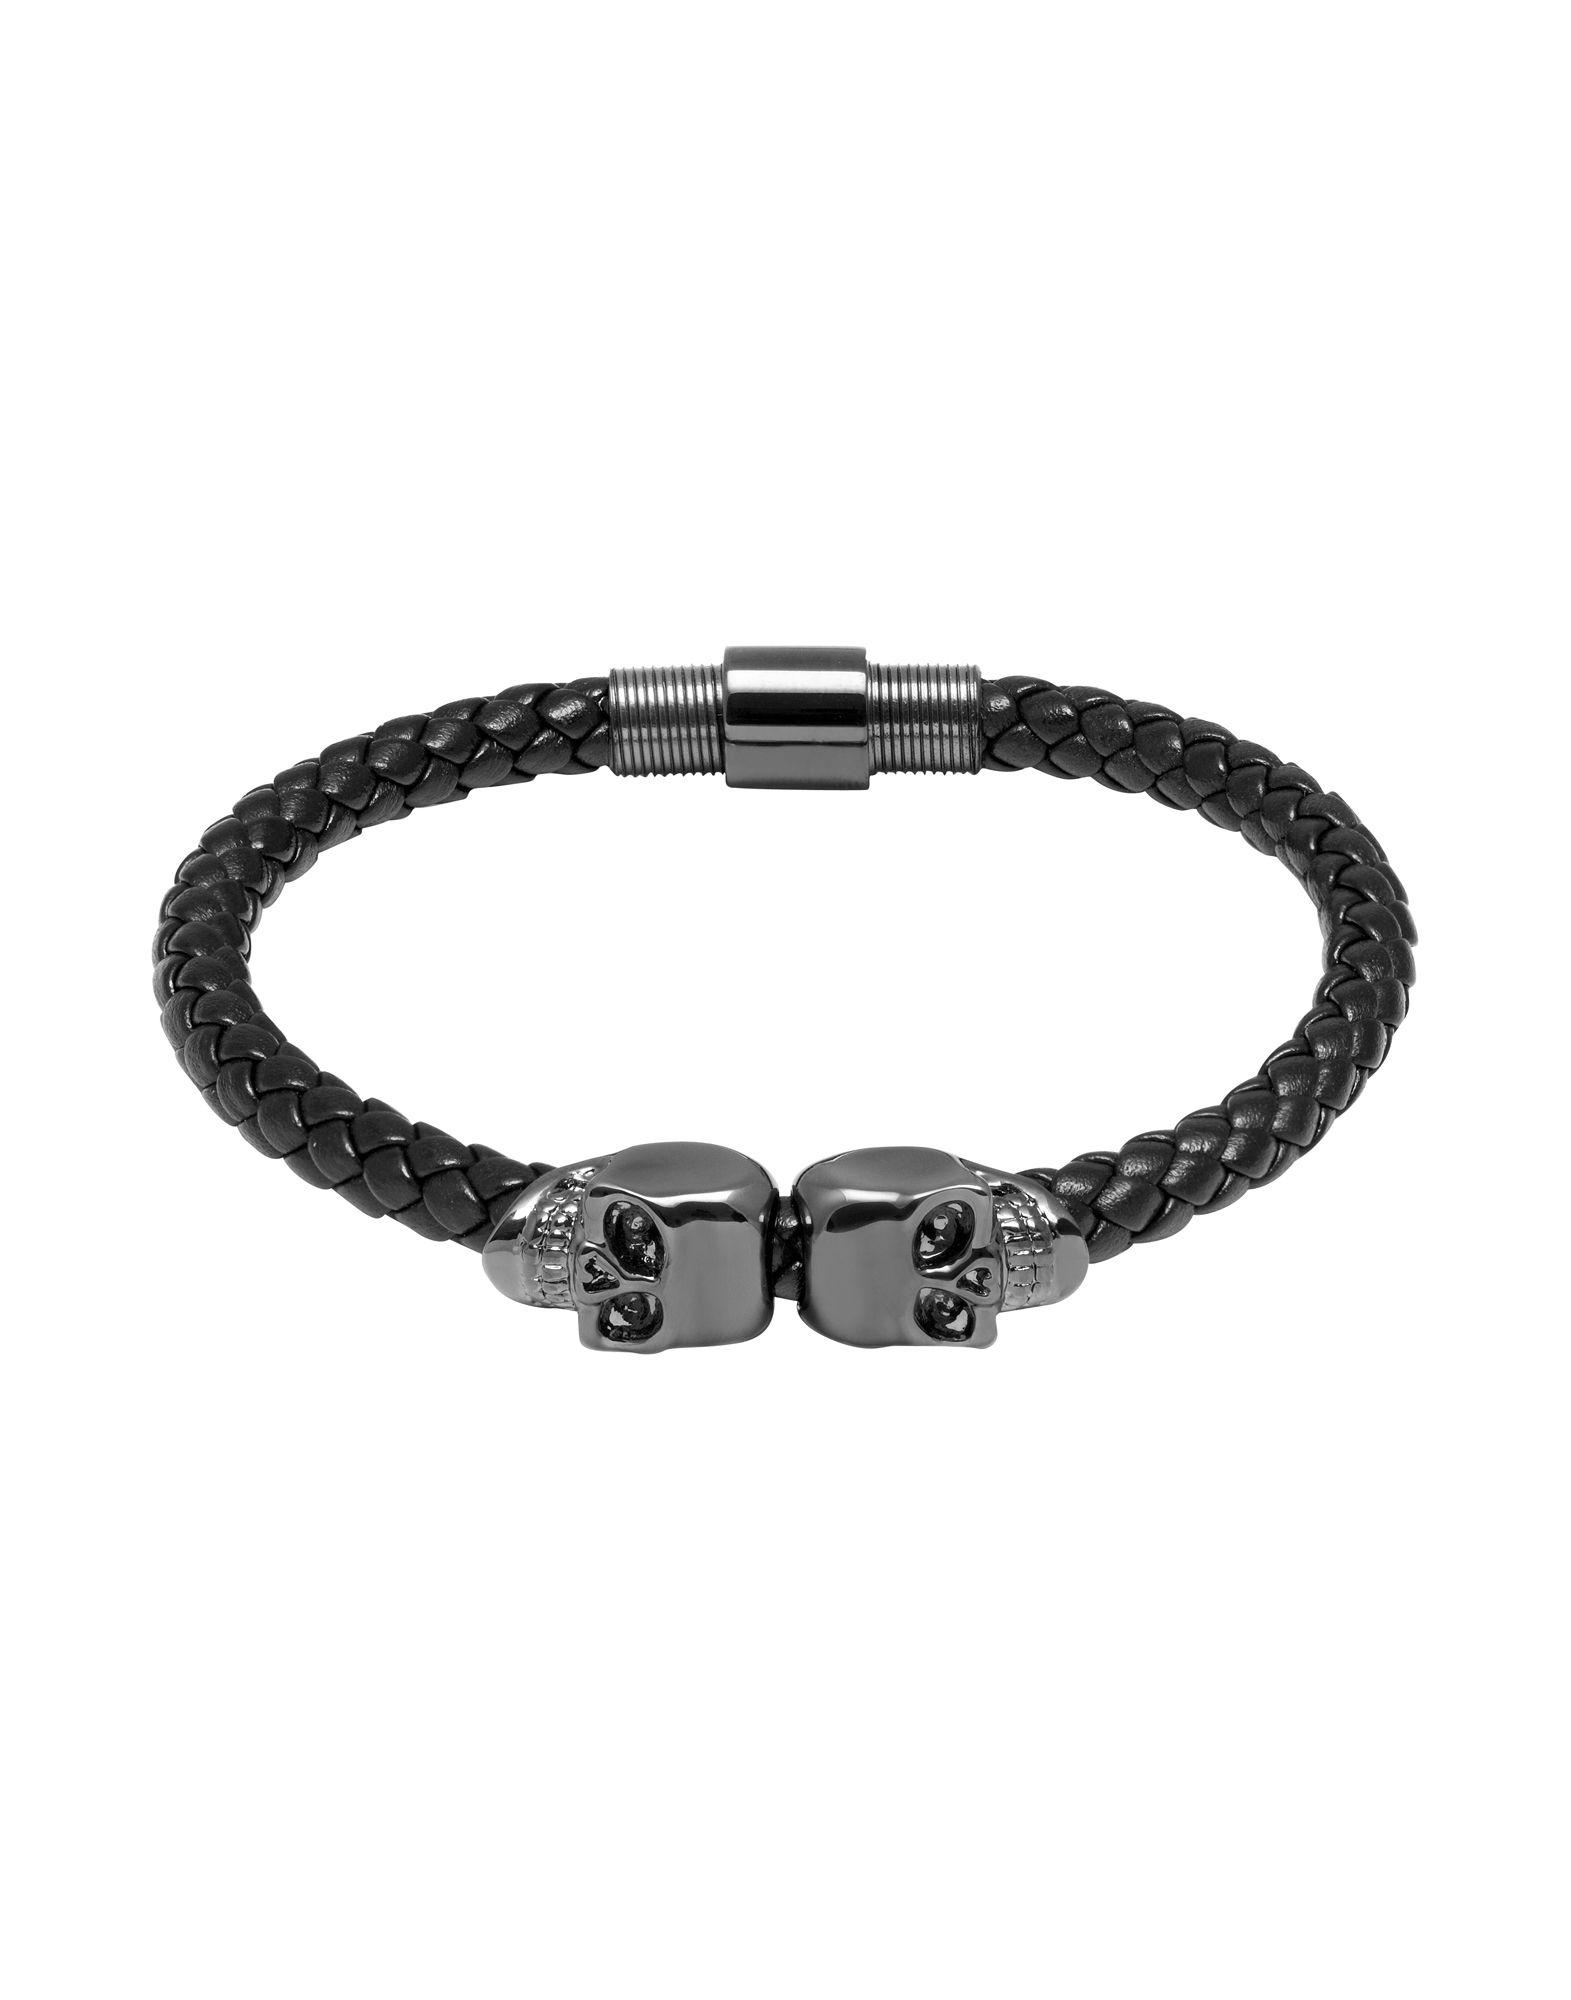 Bracciale Northskull London Twin Skull Bracelet - Uomo - Acquista online su